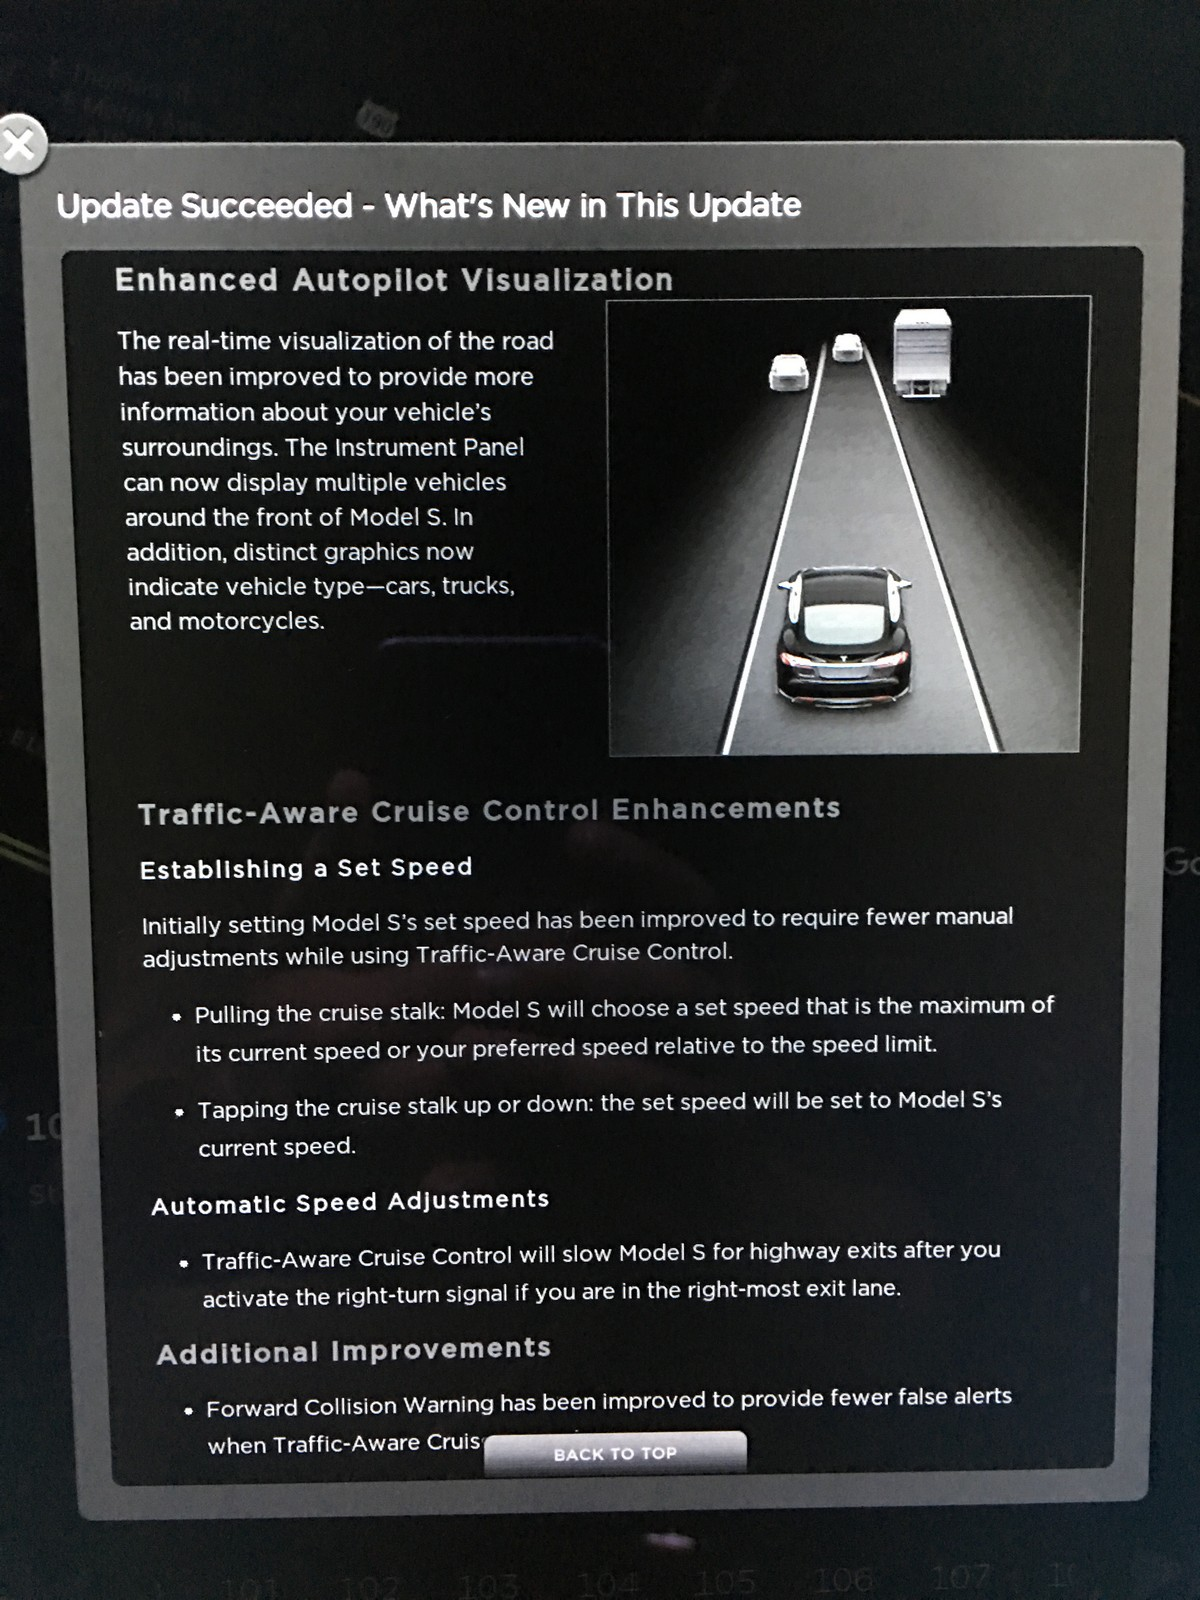 Tesla v7.1 enhanced Autopilot visualization